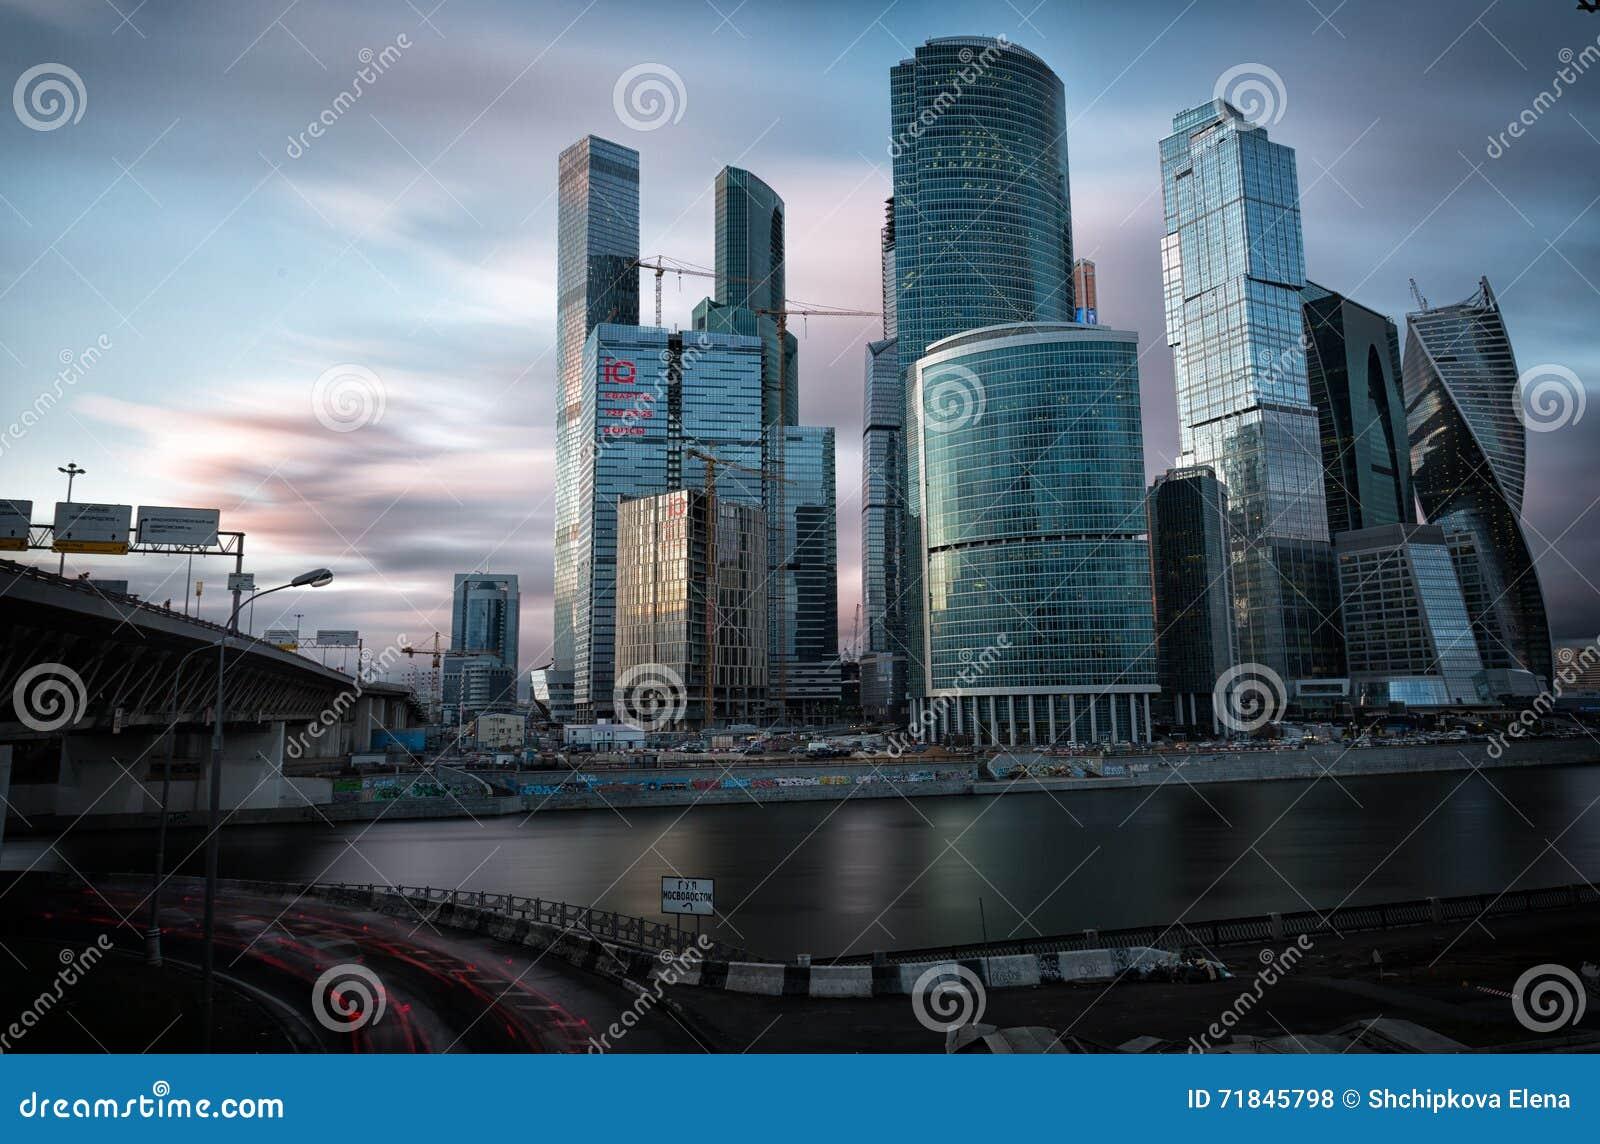 International moscow делового центра